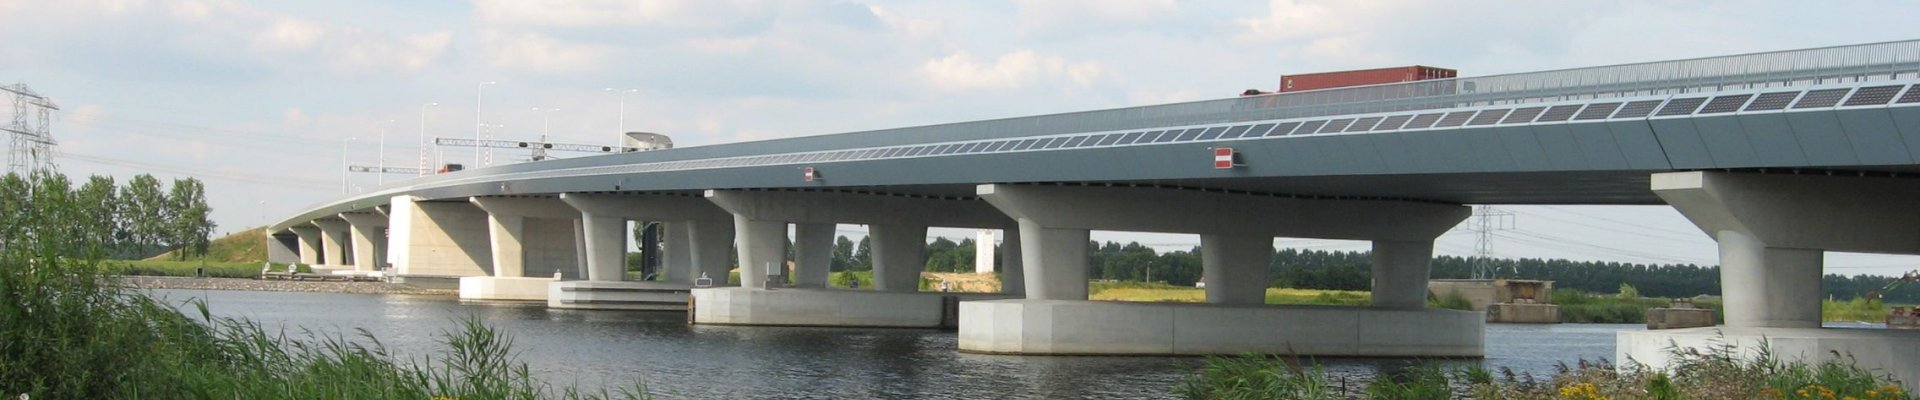 Brug-RHE-Ramspol-0011920x400